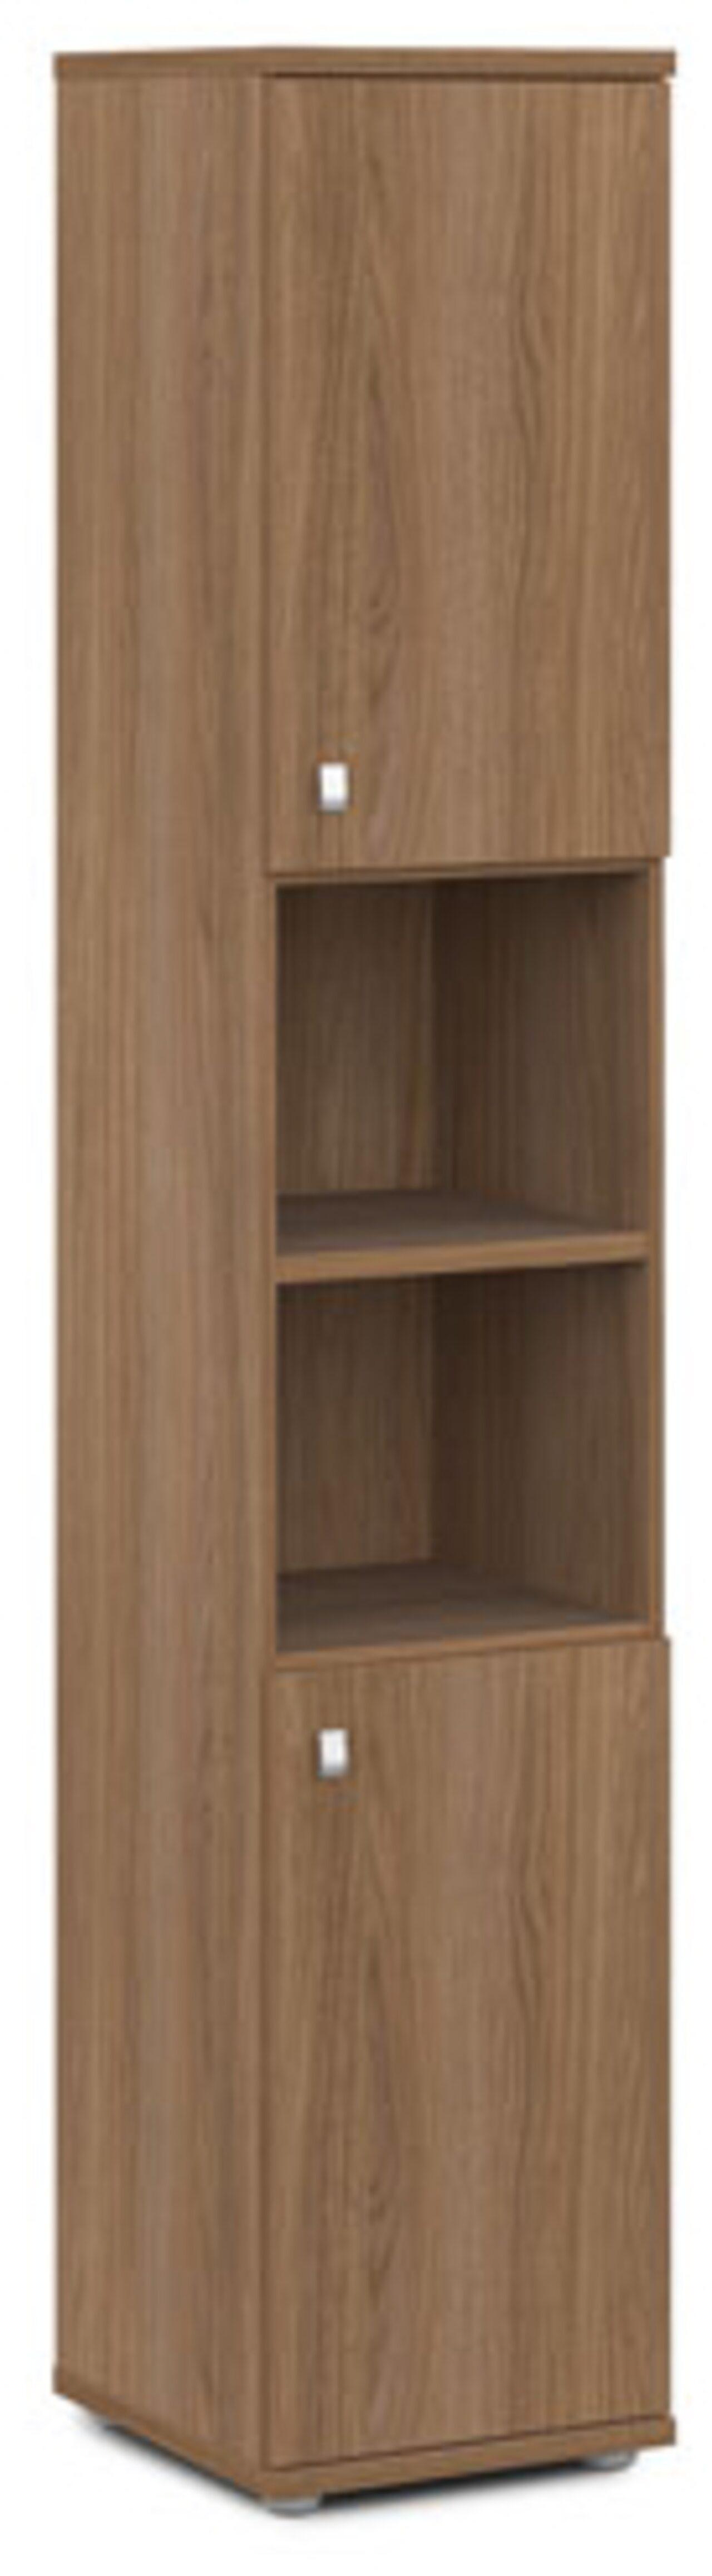 Шкаф закрытый  Vasanta 42x44x220 - фото 4